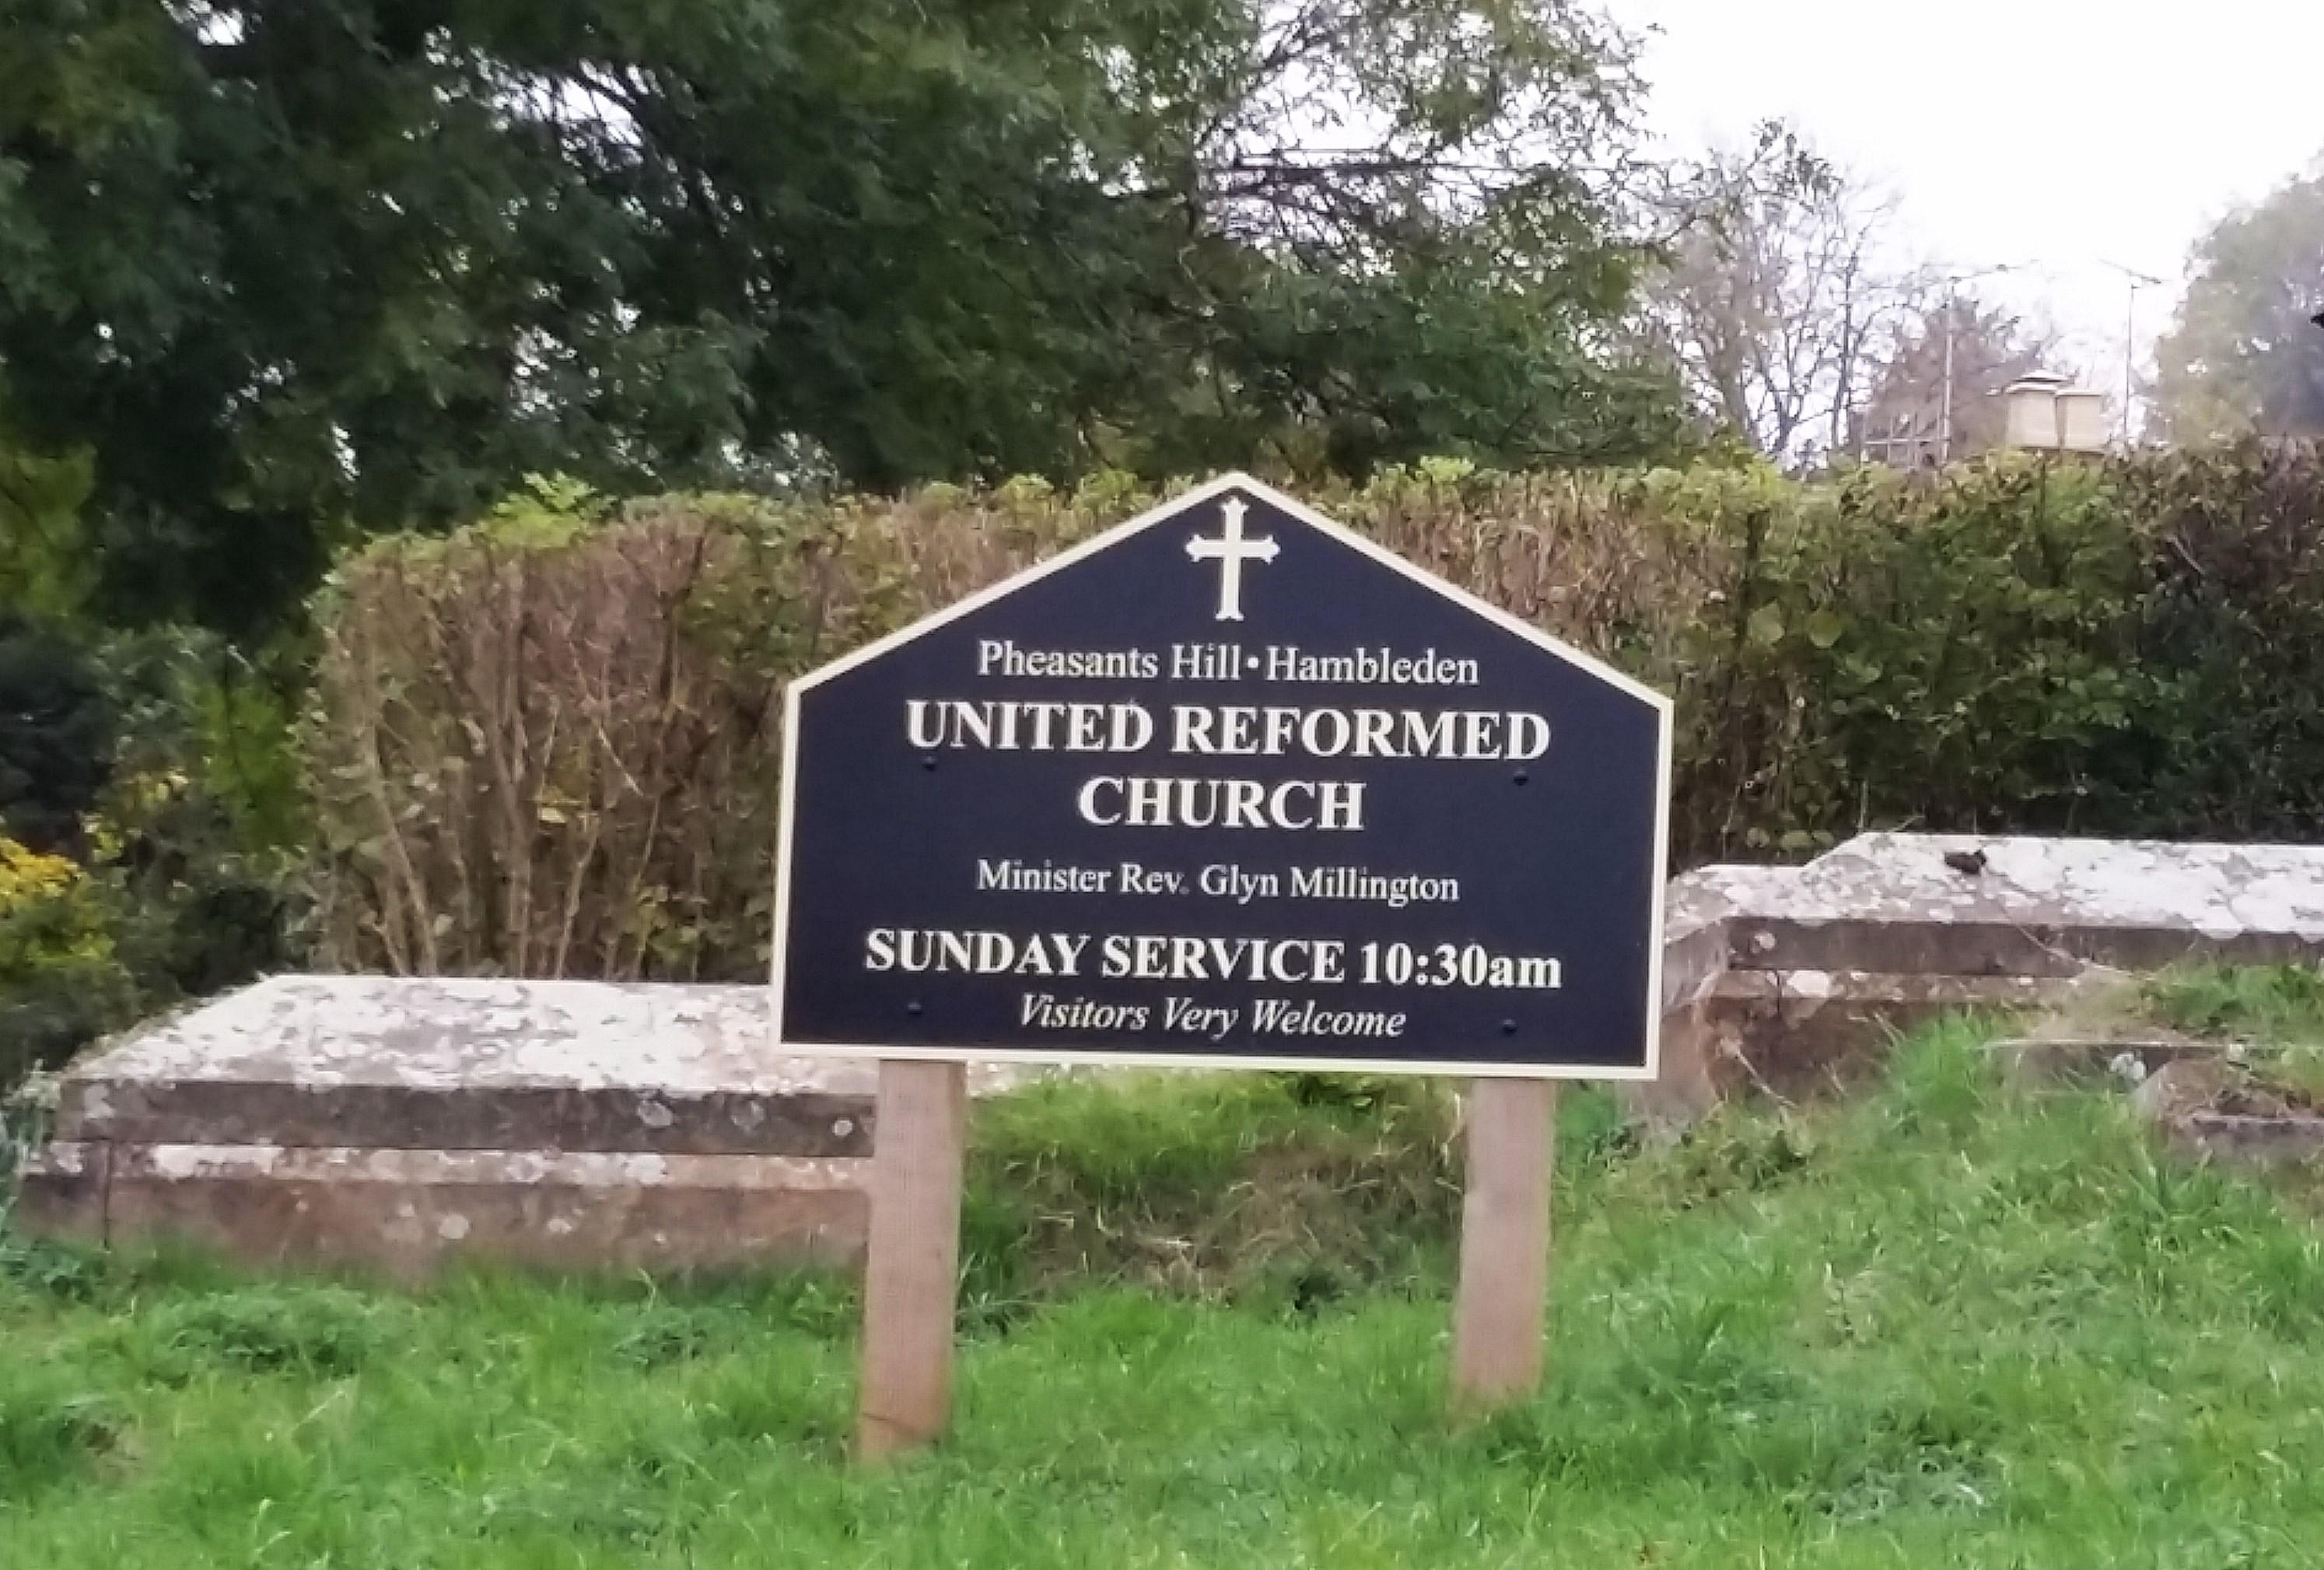 Pheasants hill church notice